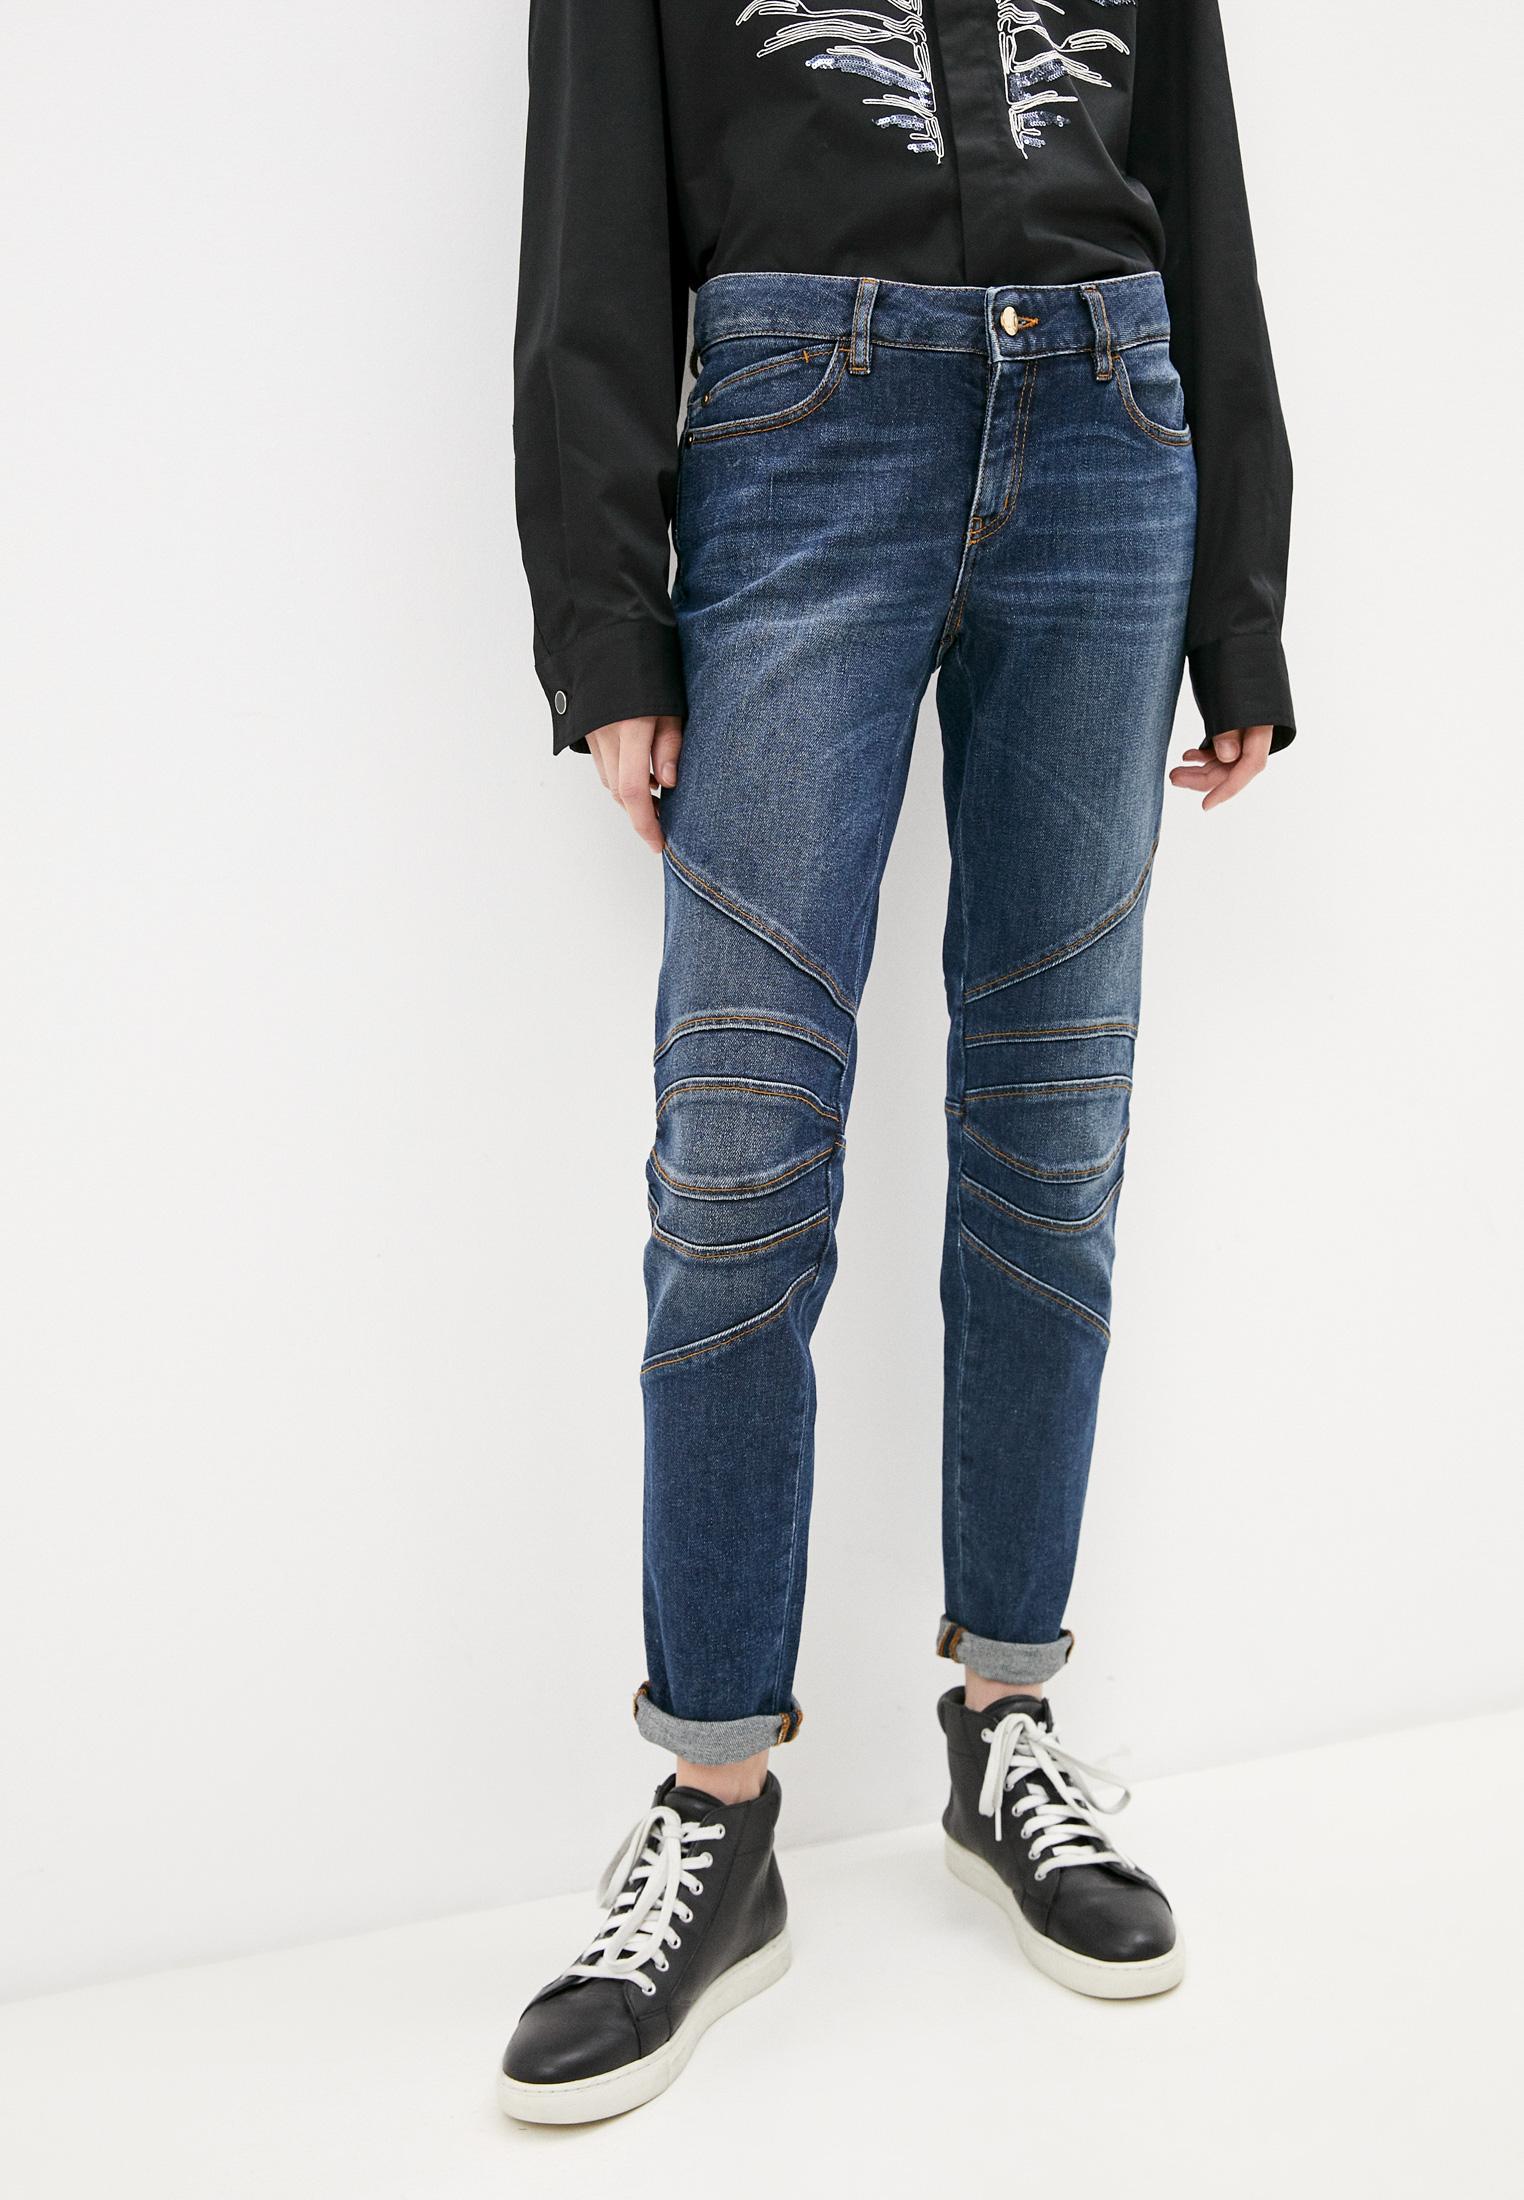 Зауженные джинсы Just Cavalli (Джаст Кавалли) S02LA0175 N31670